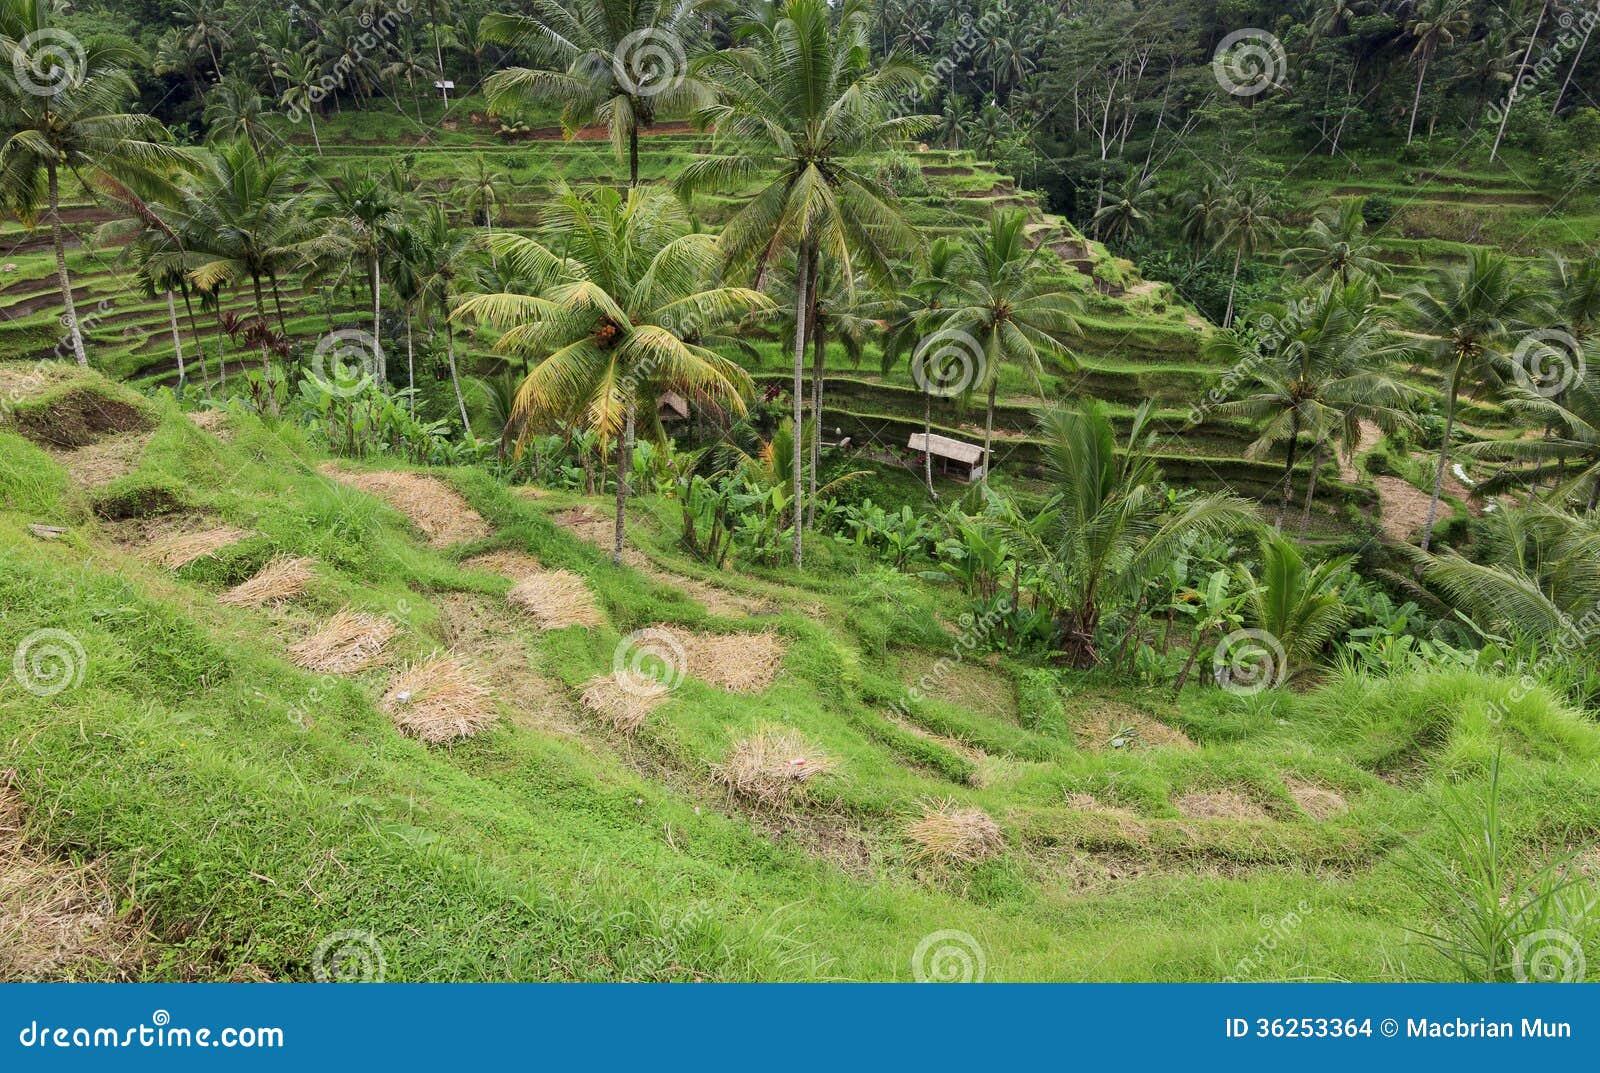 Terrace rice paddy field at ubud bali stock images for Terrace ubud bali